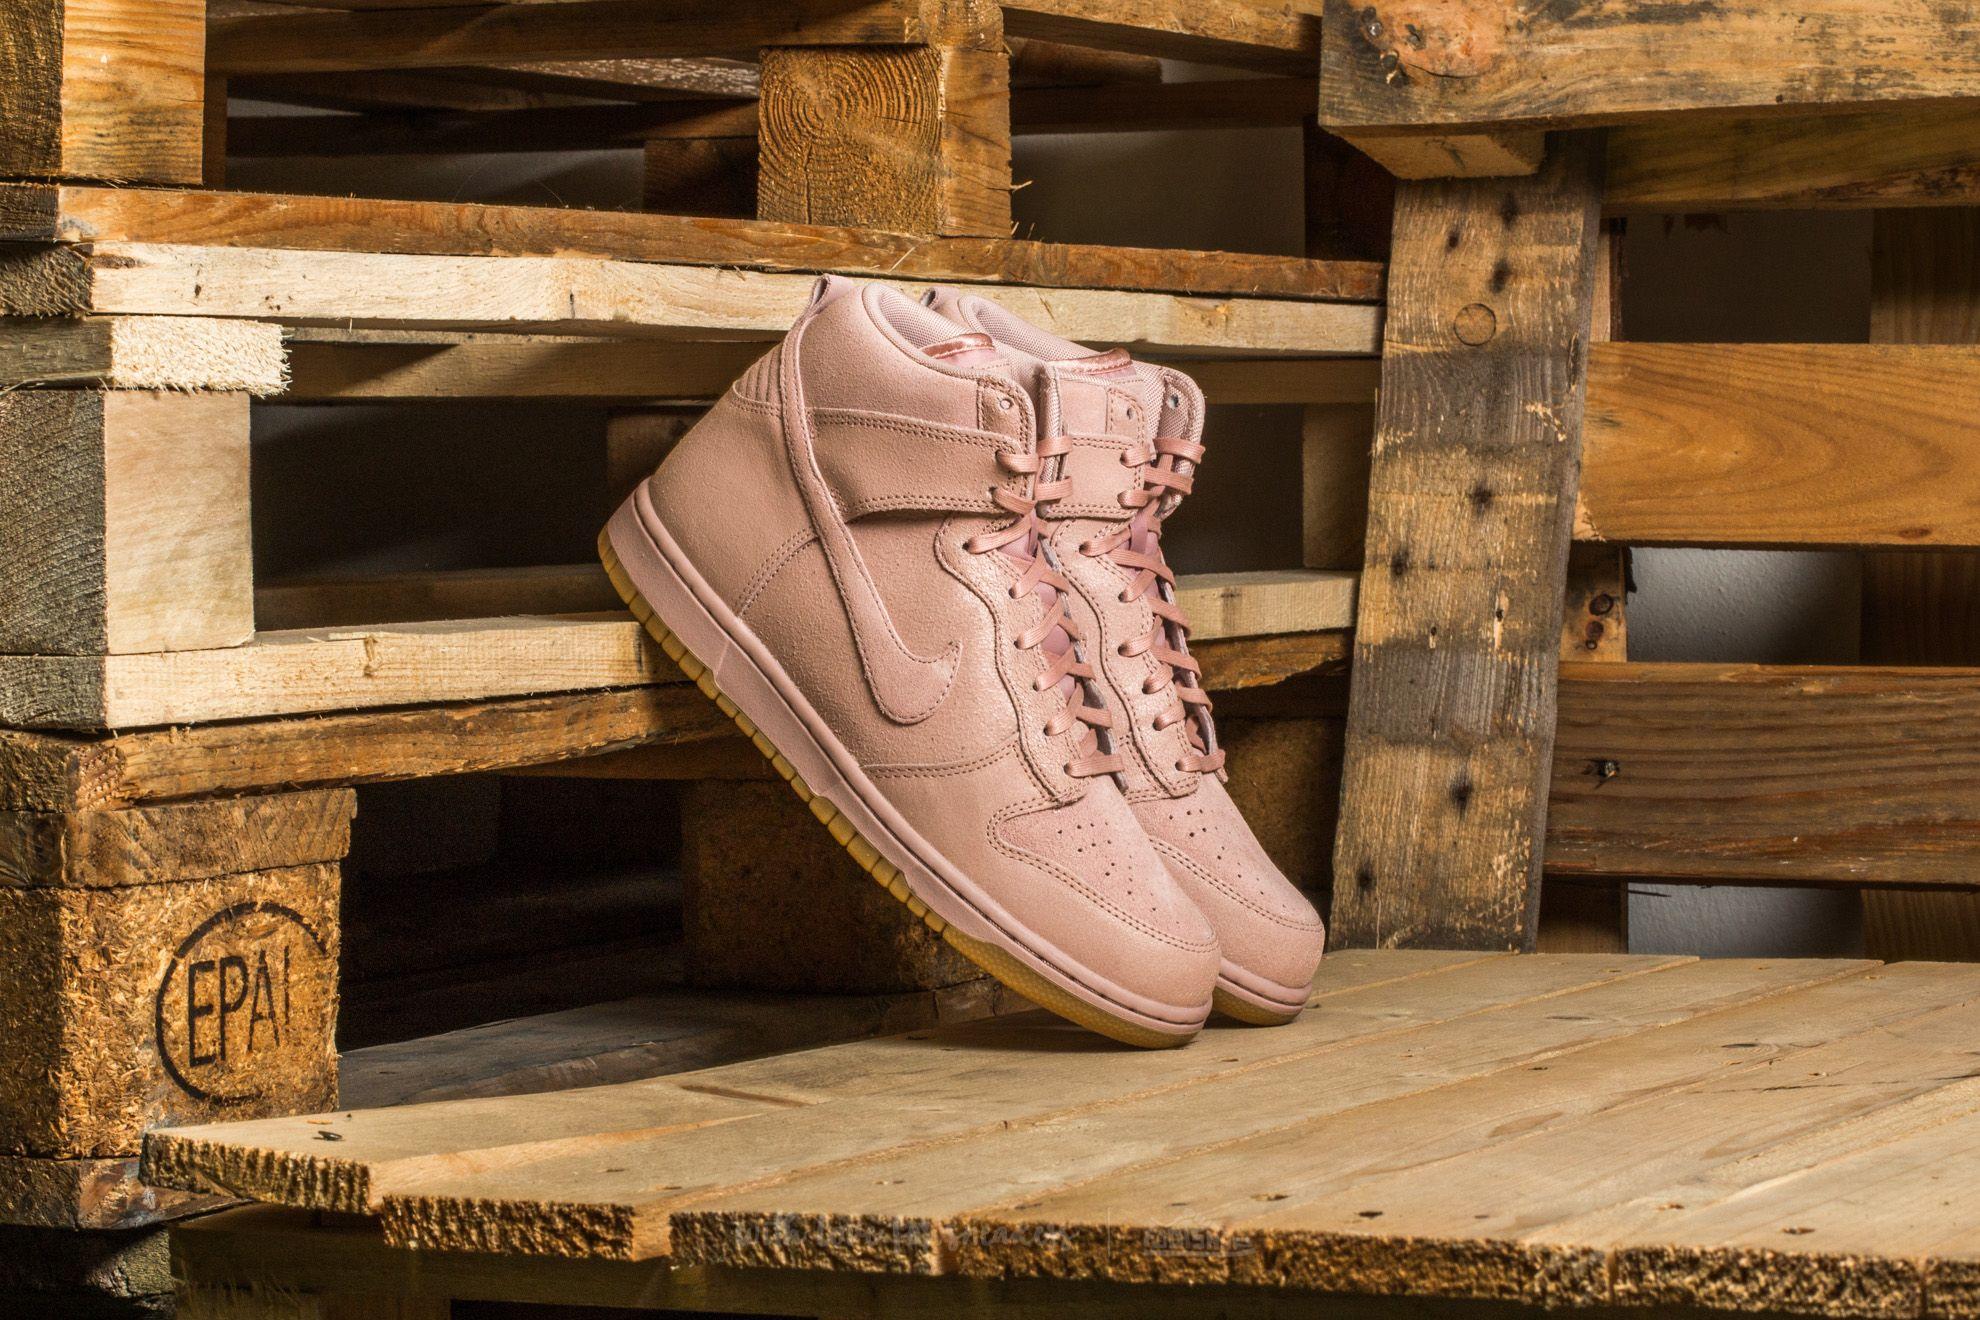 Nike W Dunk Hi Premium Pink Oxford/ Pink Oxford